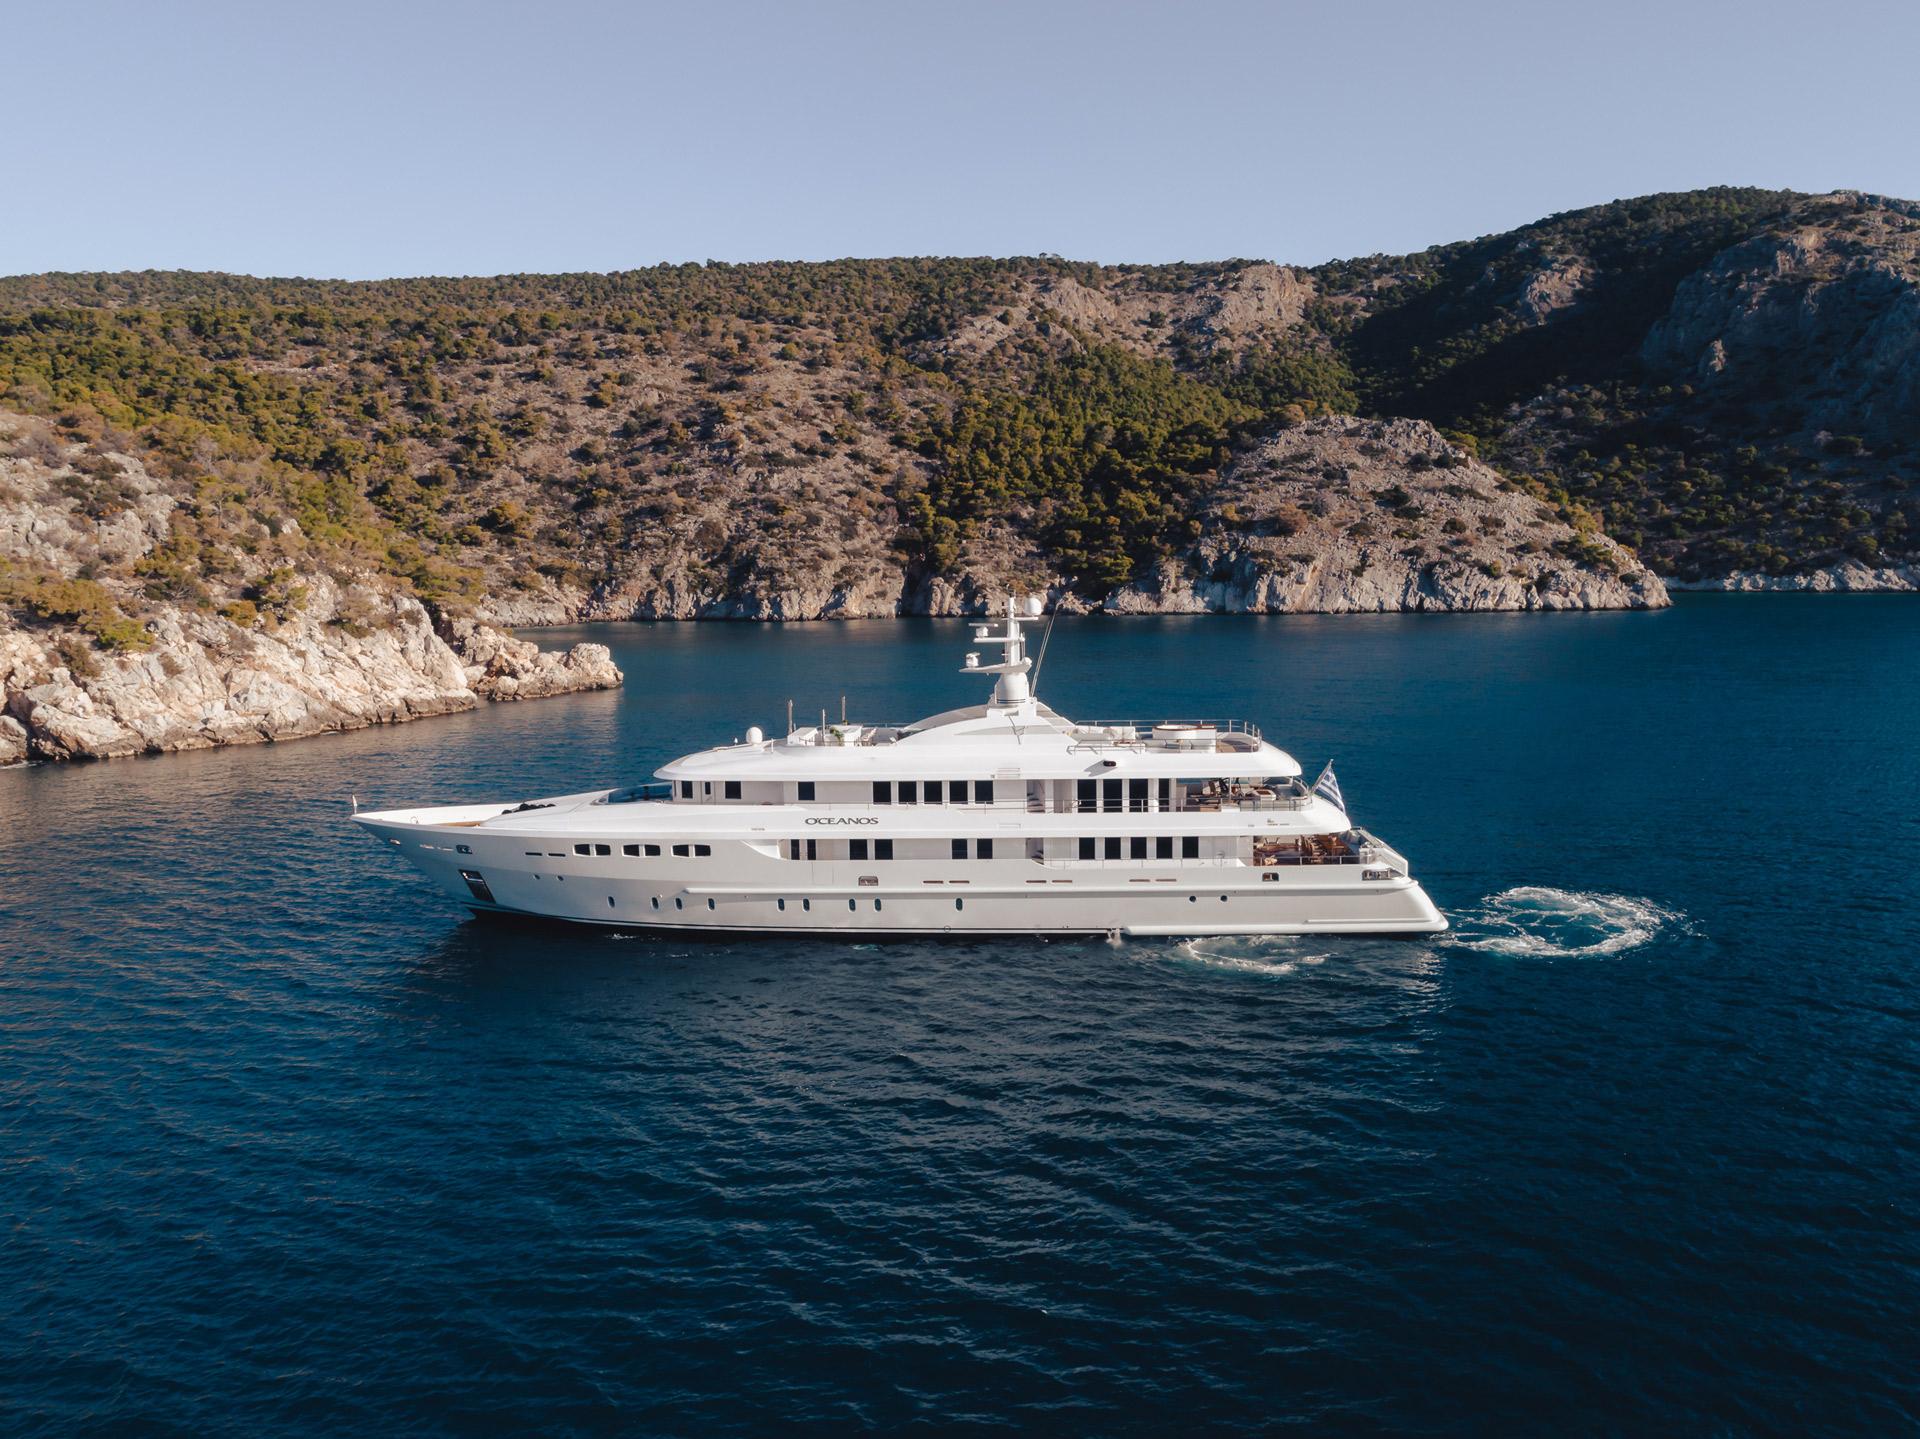 O'CEANOS Charter Yacht Profile